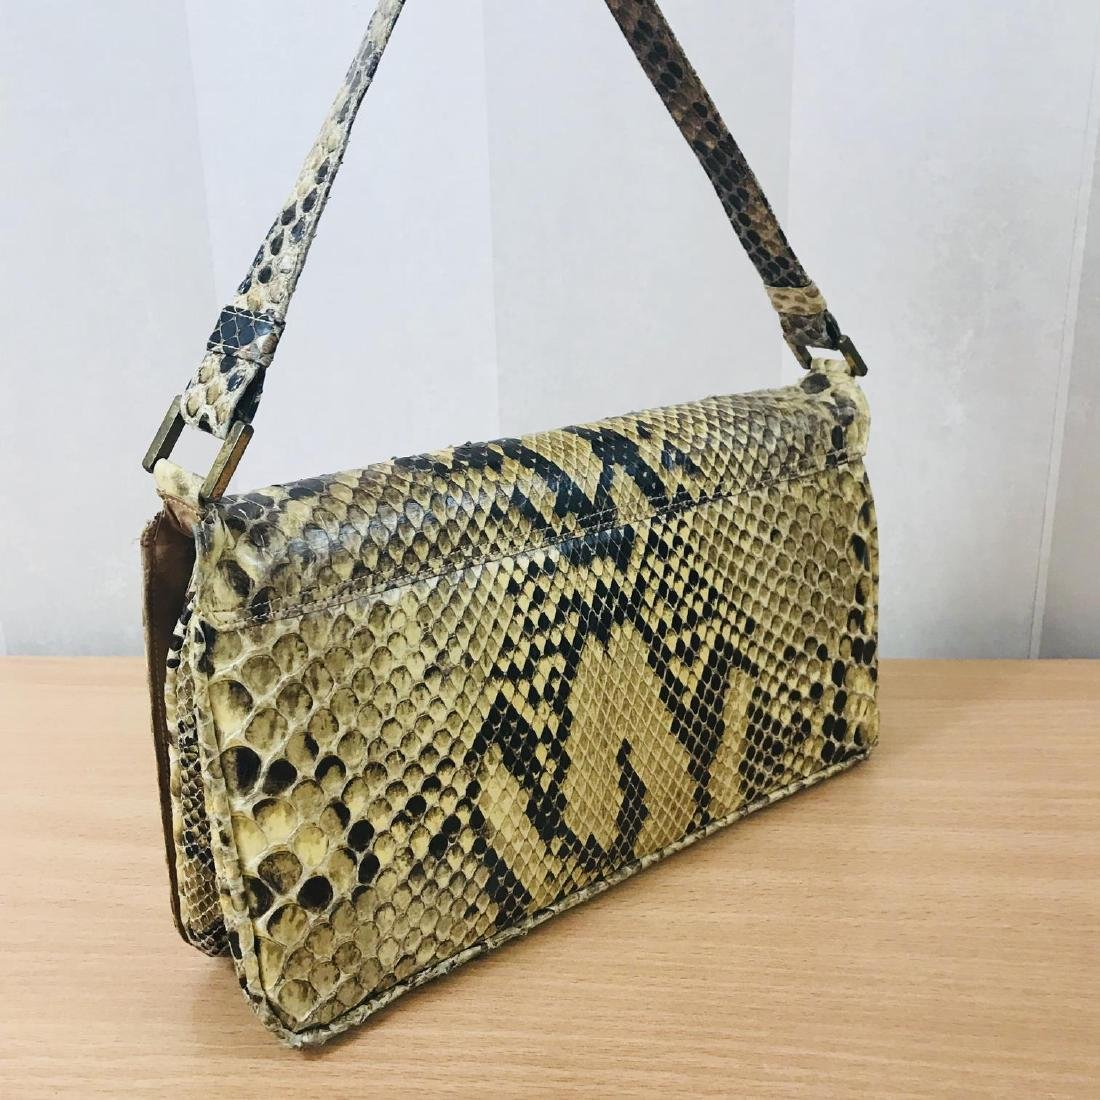 Vintage Snakeskin Leather Handbag - 4